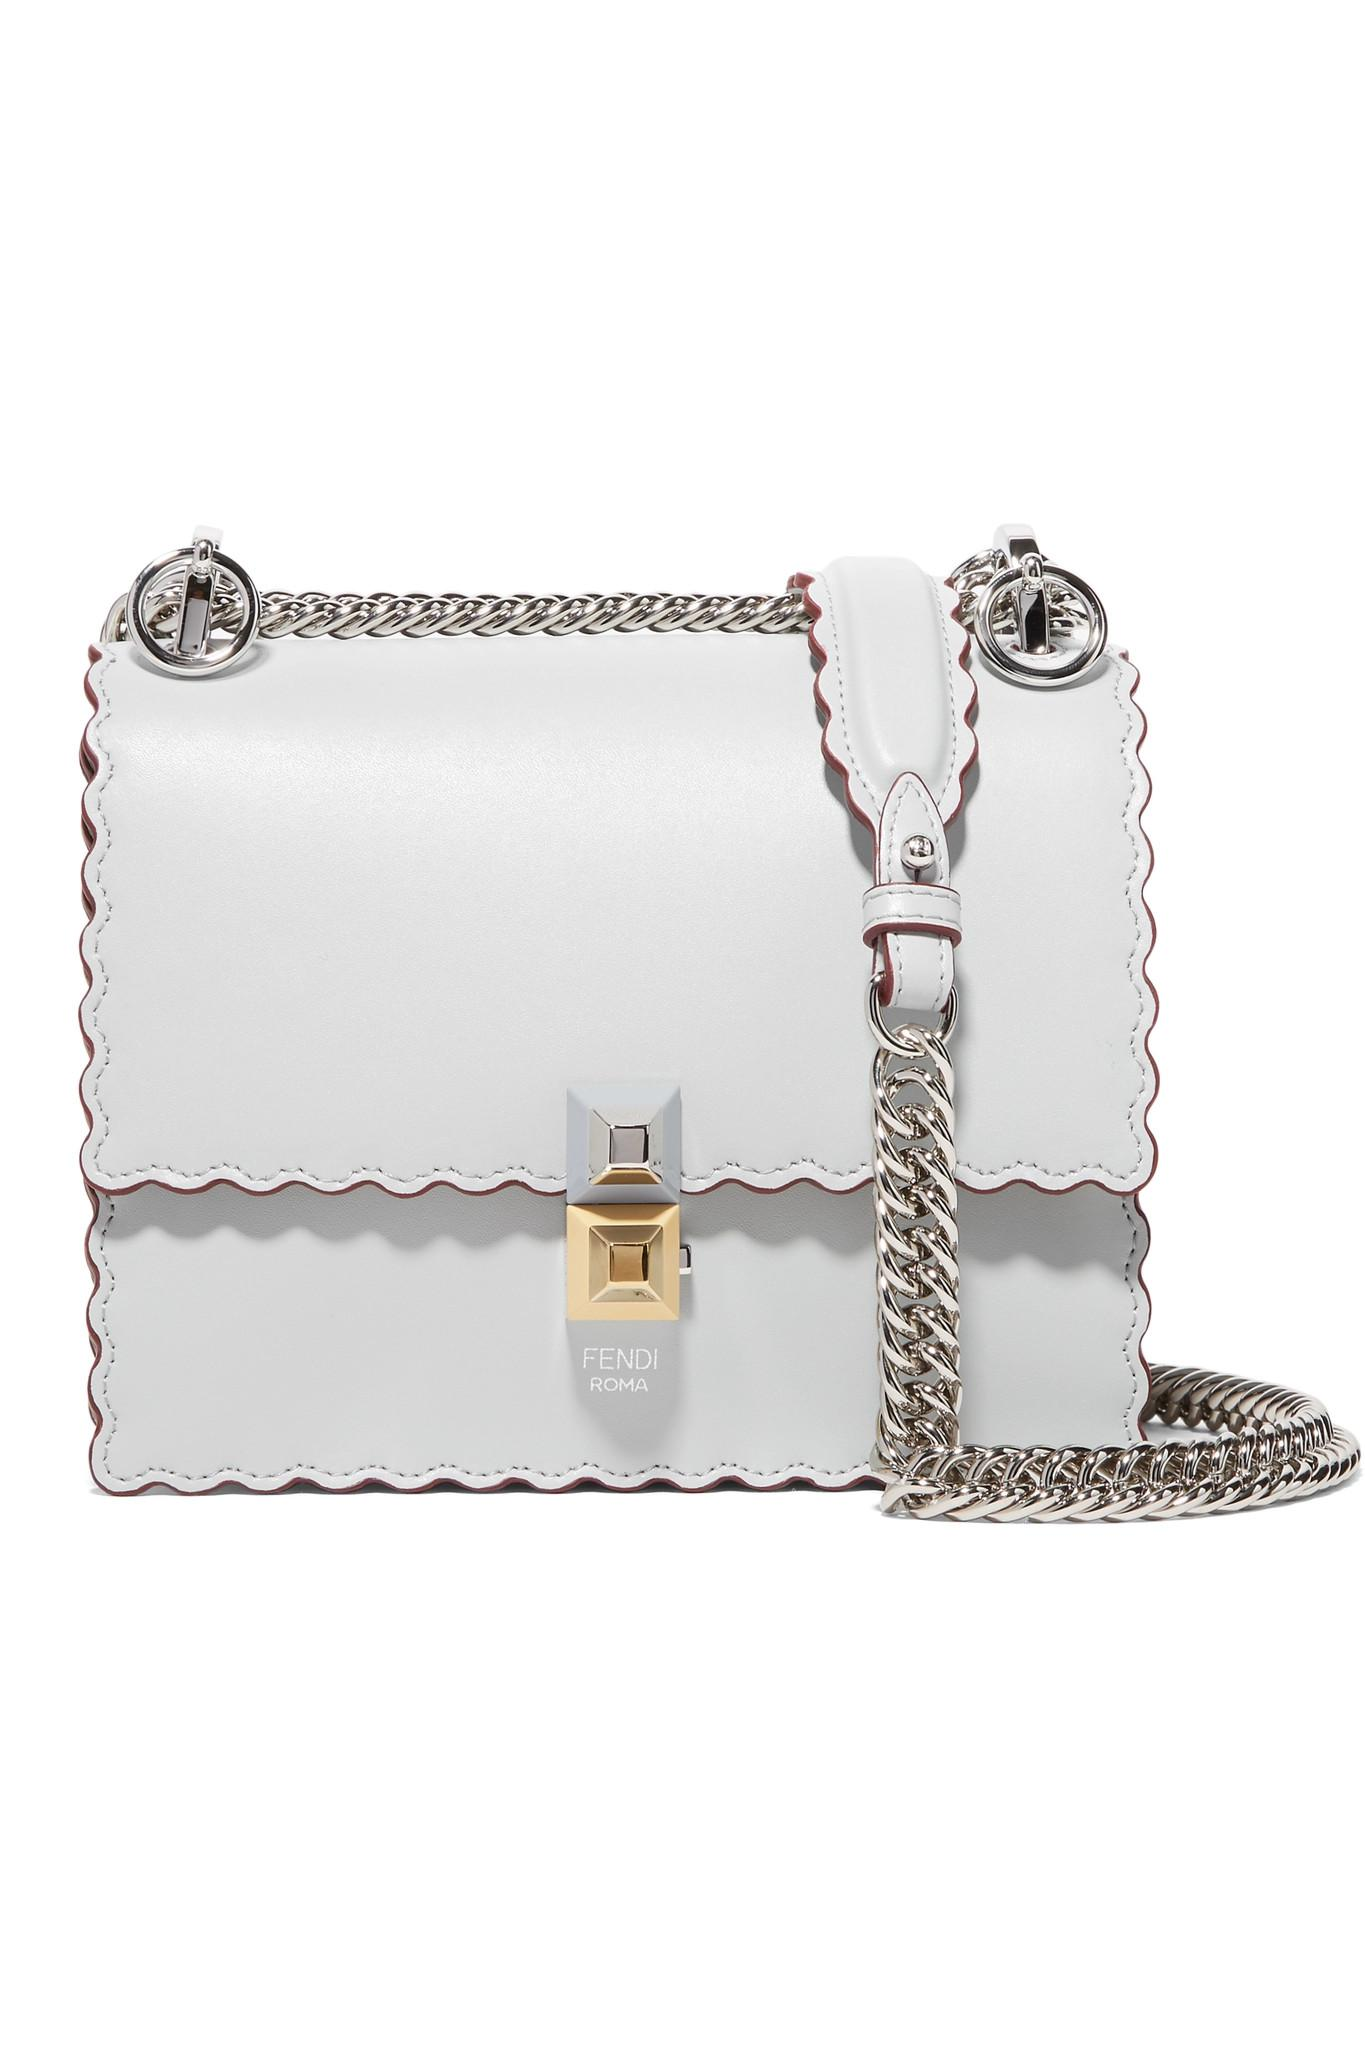 Fendi Kan I Mini Scalloped Leather Shoulder Bag in Gray - Lyst f7cfc1085a815